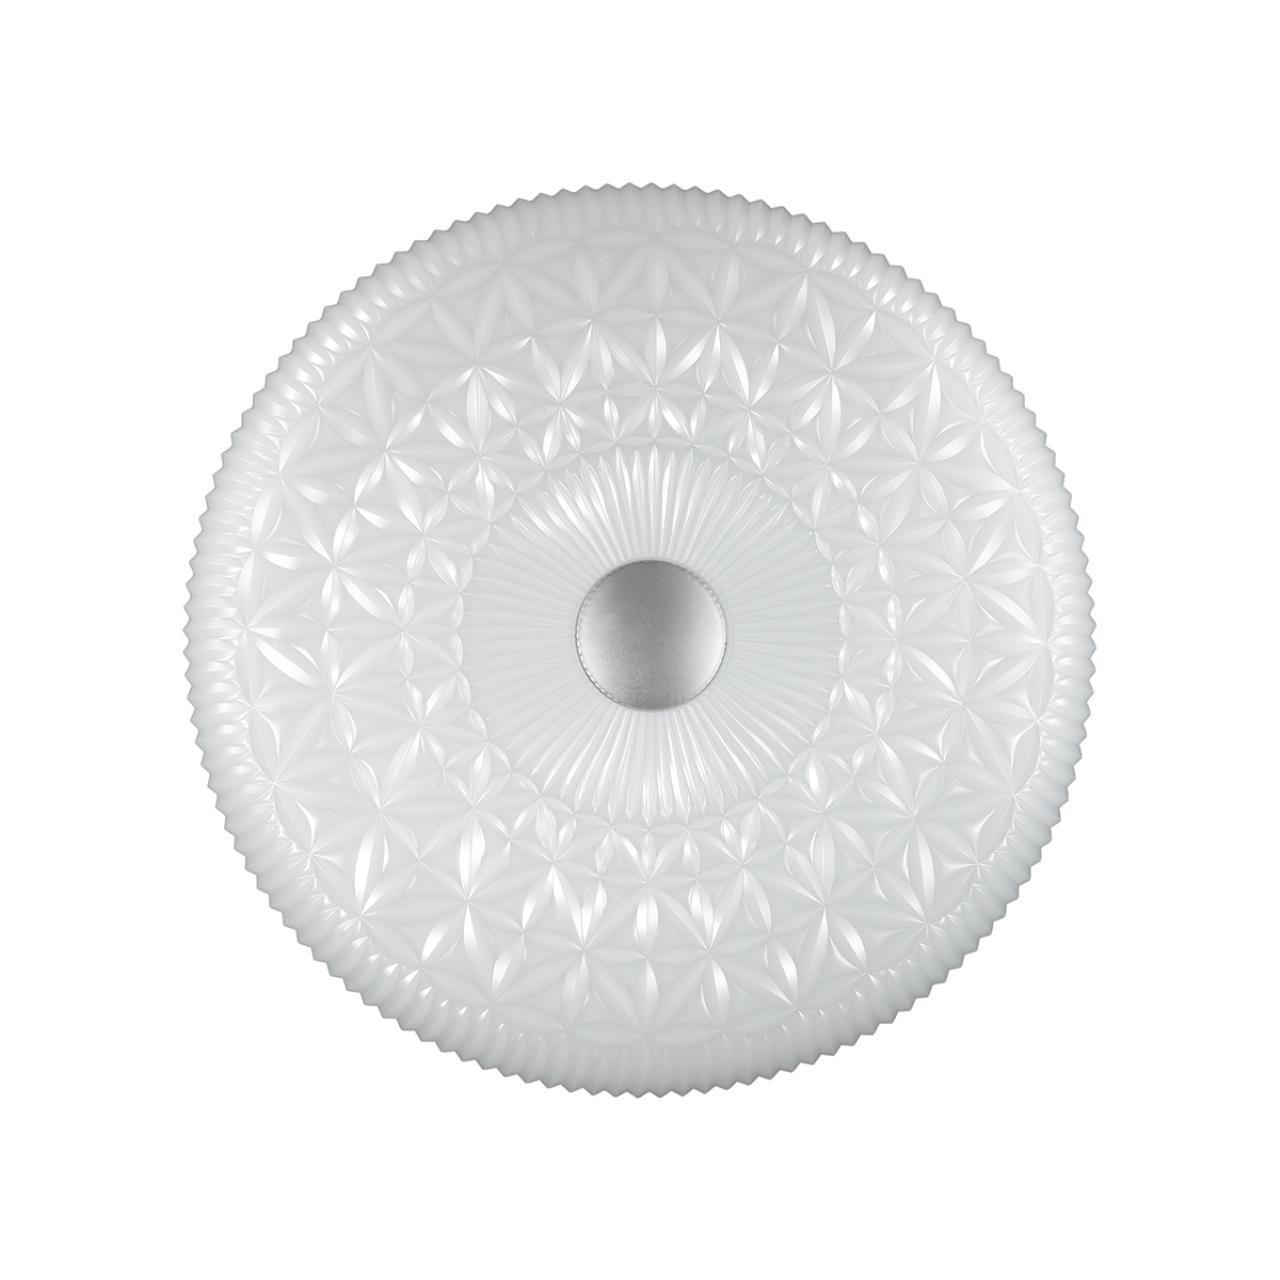 2086/EL SN 059 св-к KARIDA пластик LED 72Вт 3000-6000K D500 IP43 пульт ДУ